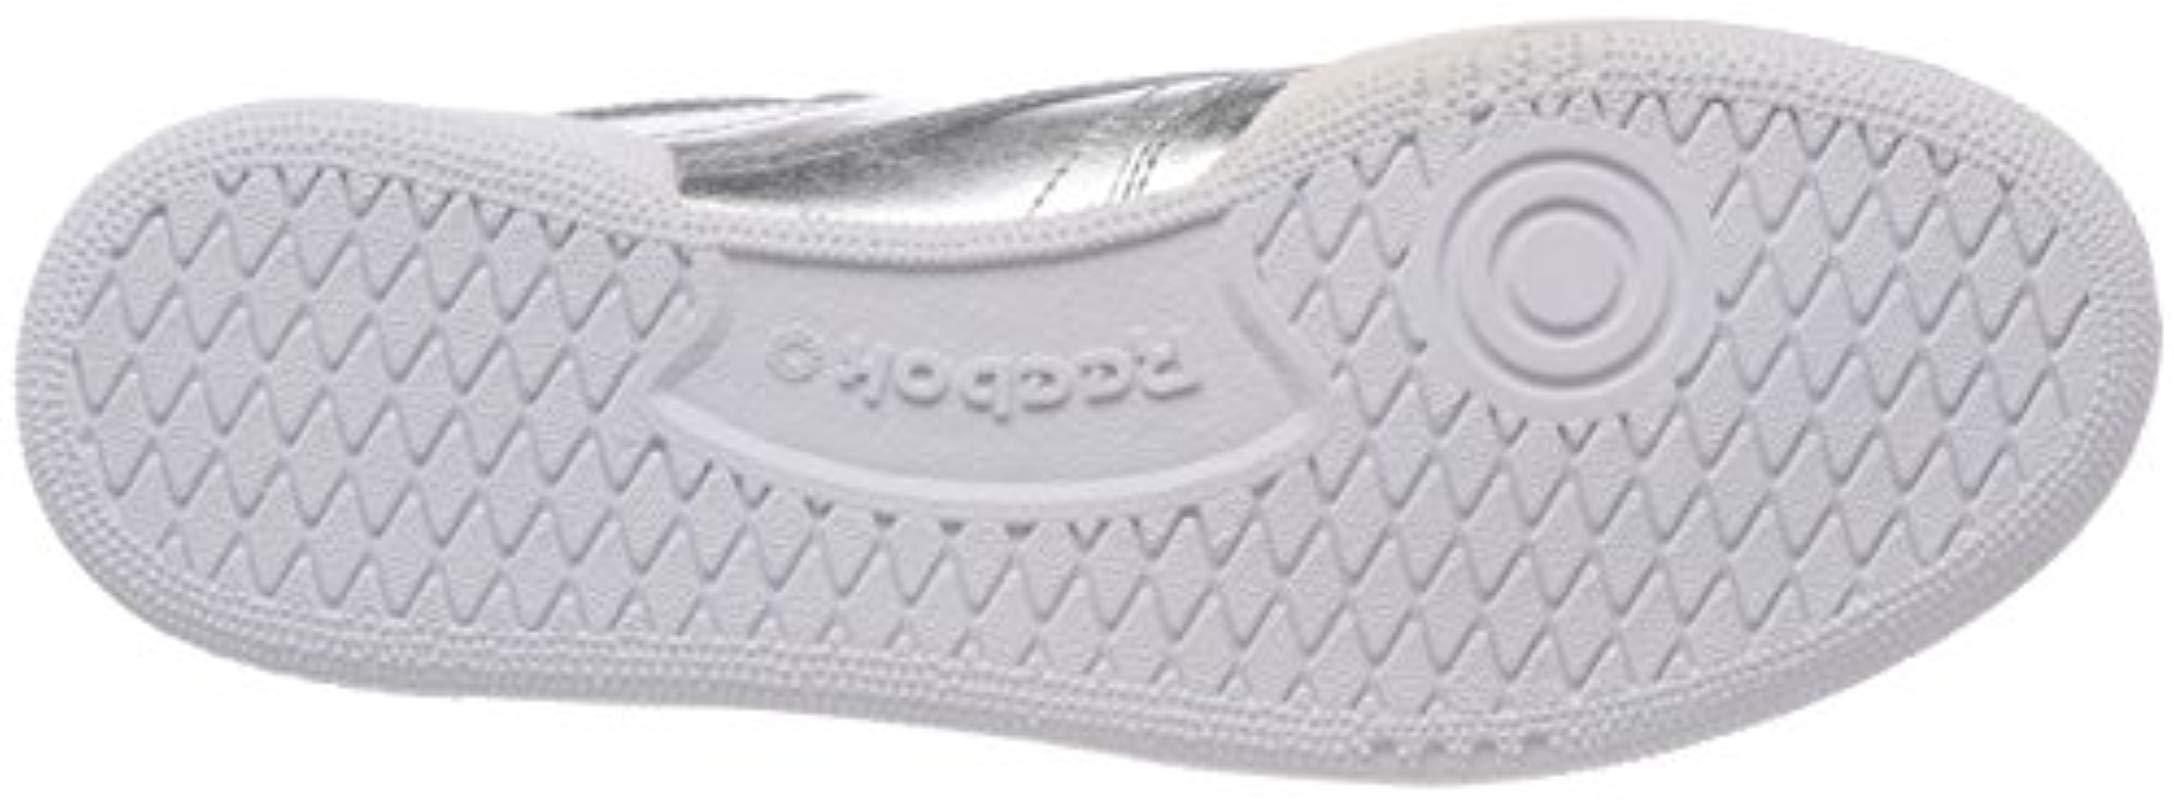 Reebok Leather Club C 85 S Shine Tennis Shoes in Silver (Metallic)